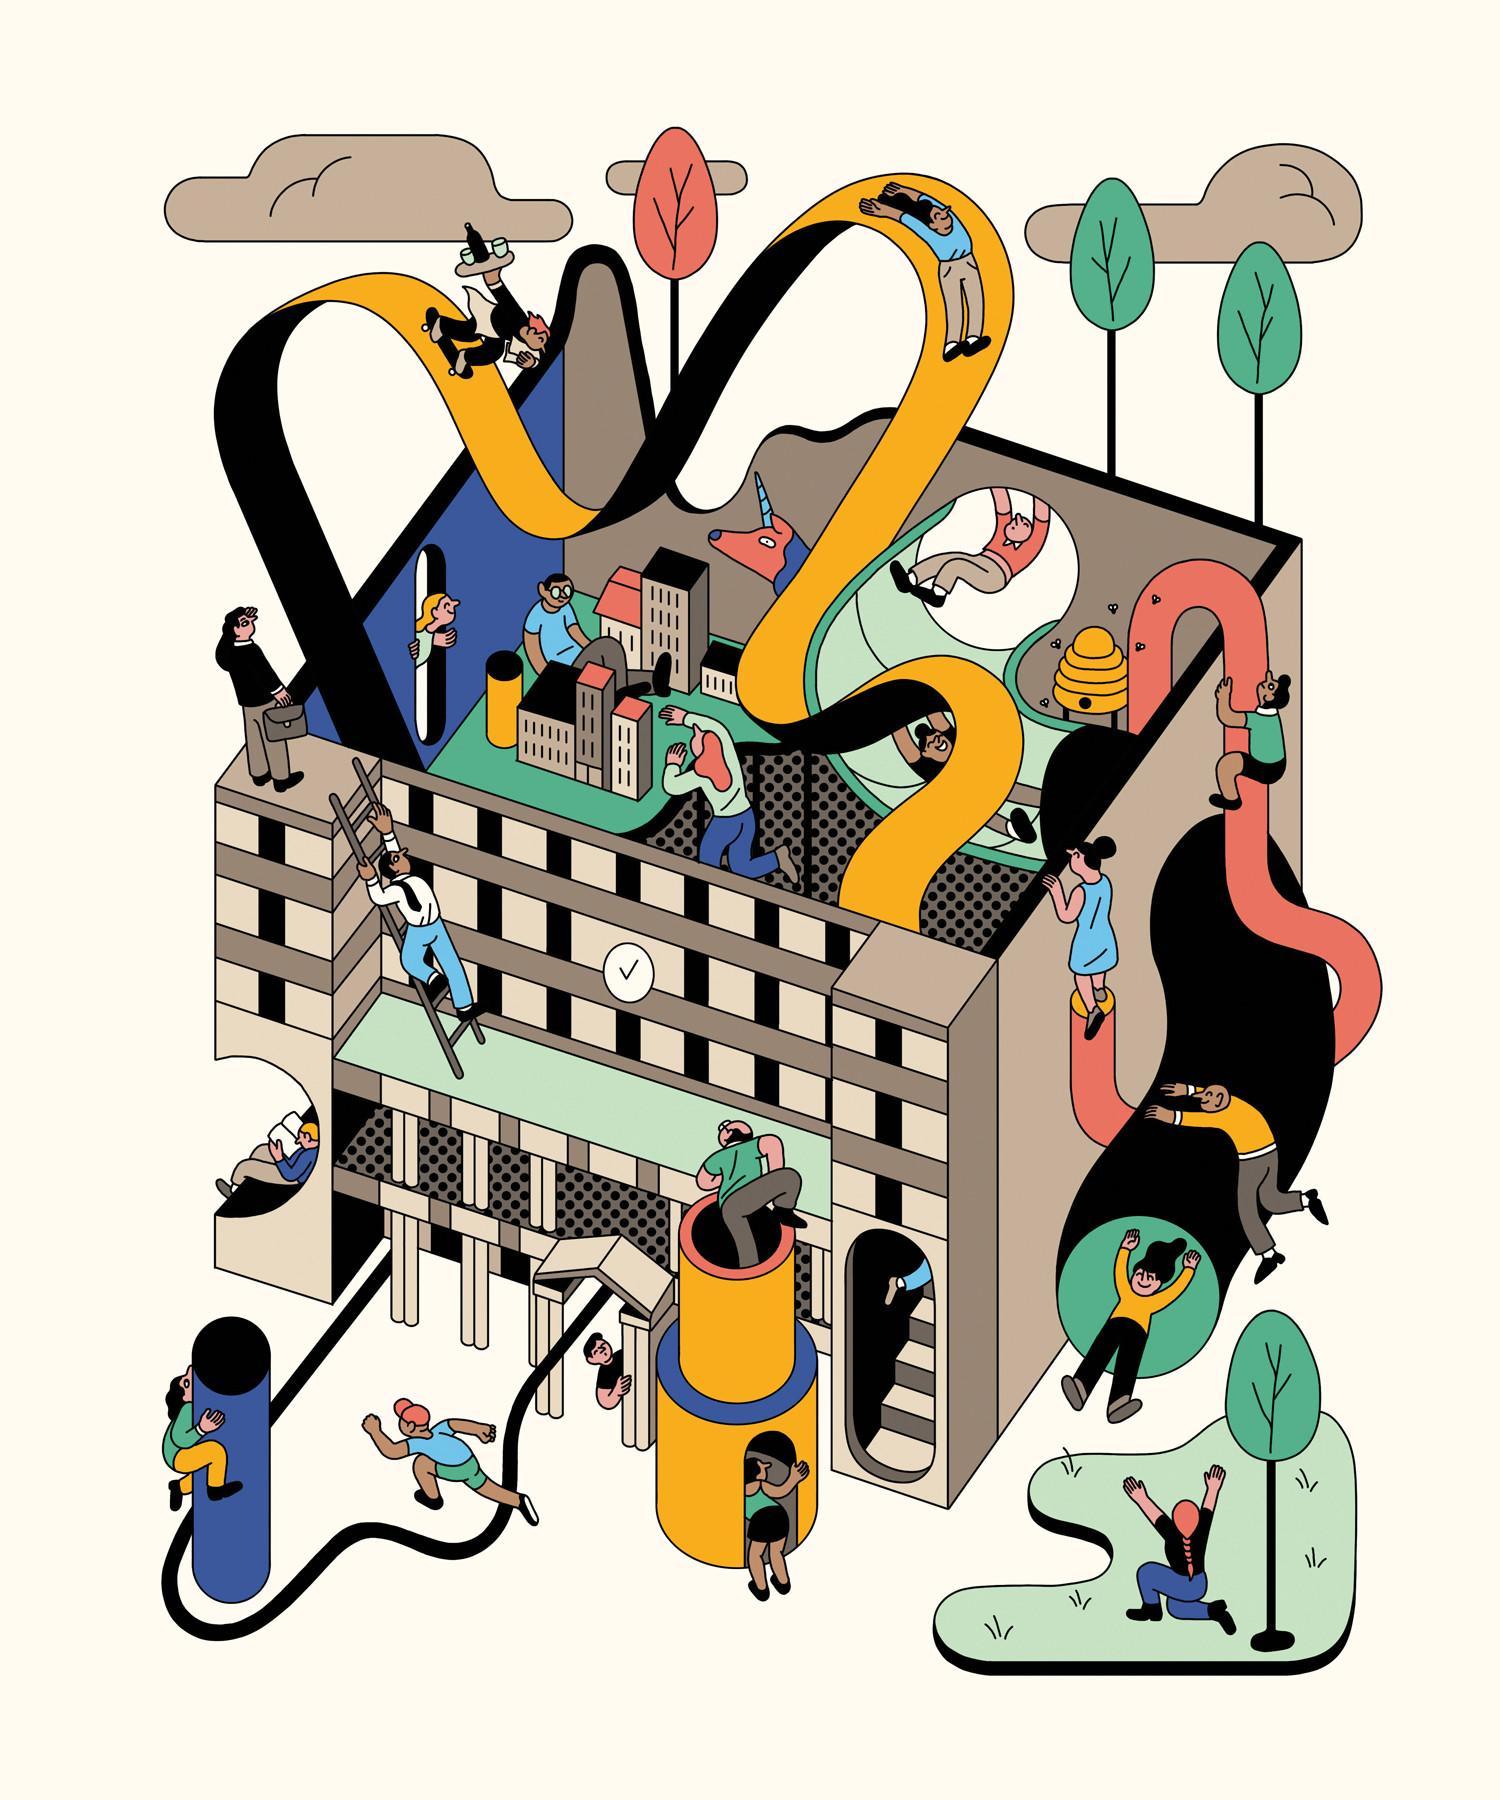 Customs House Artist Series by Leah Procko